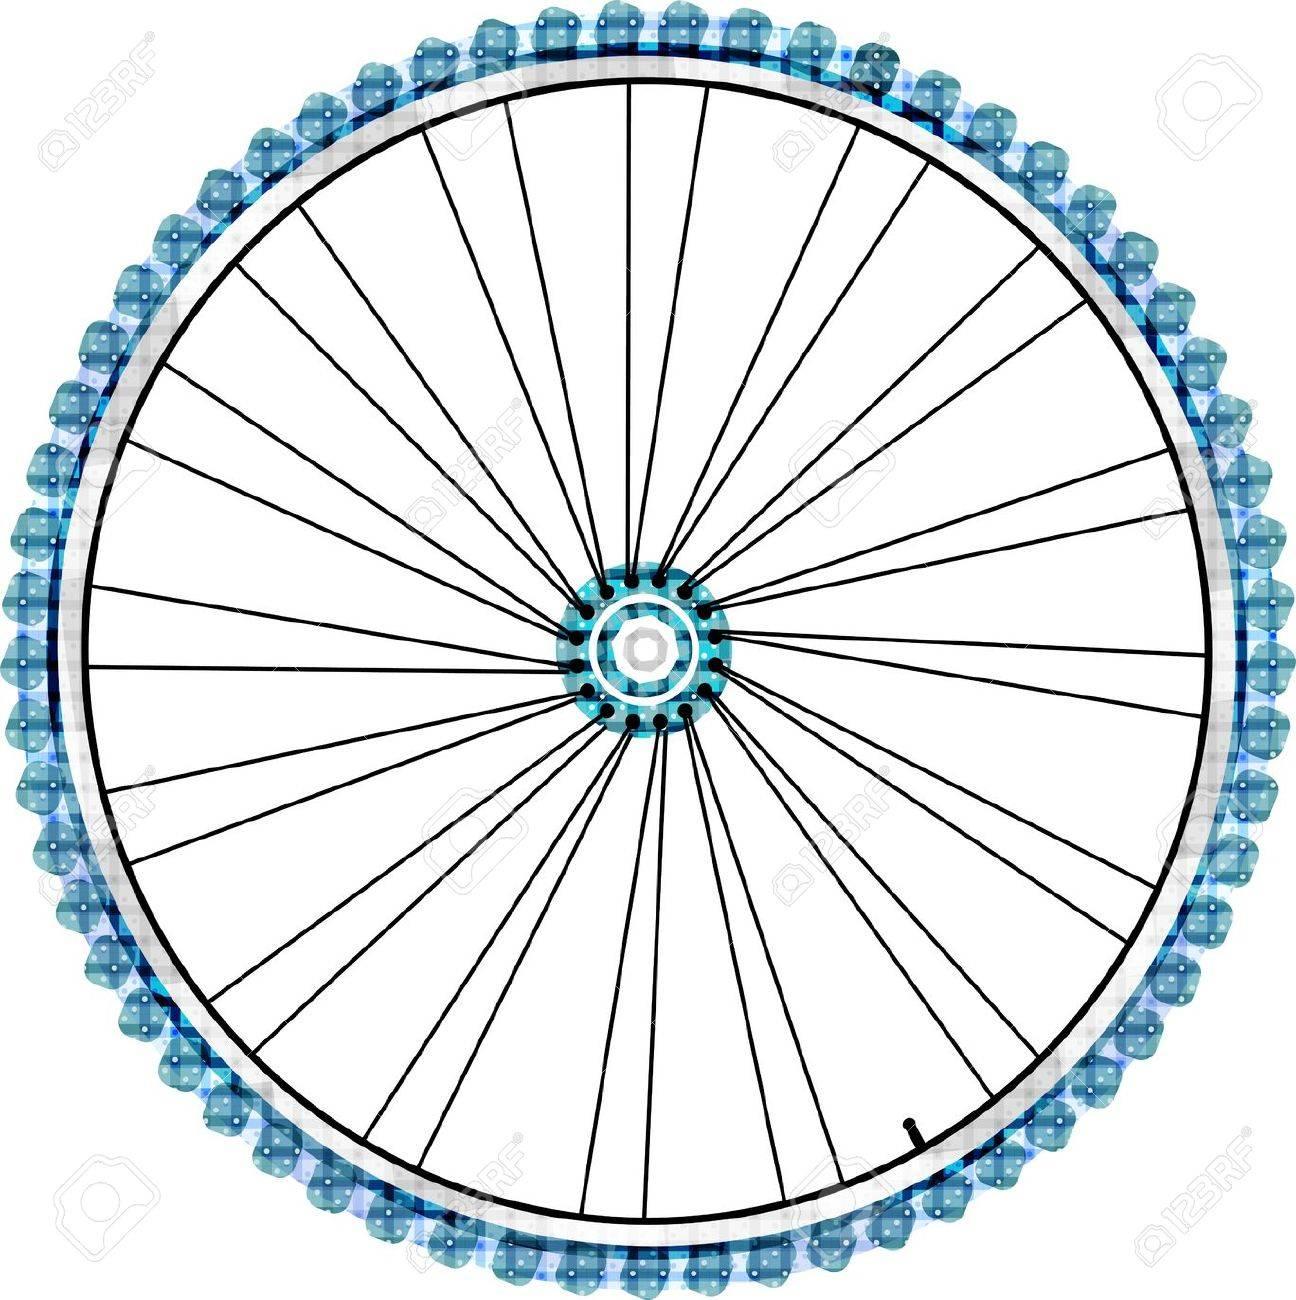 Bike wheel isolated on white background. vector illustration - 12632827